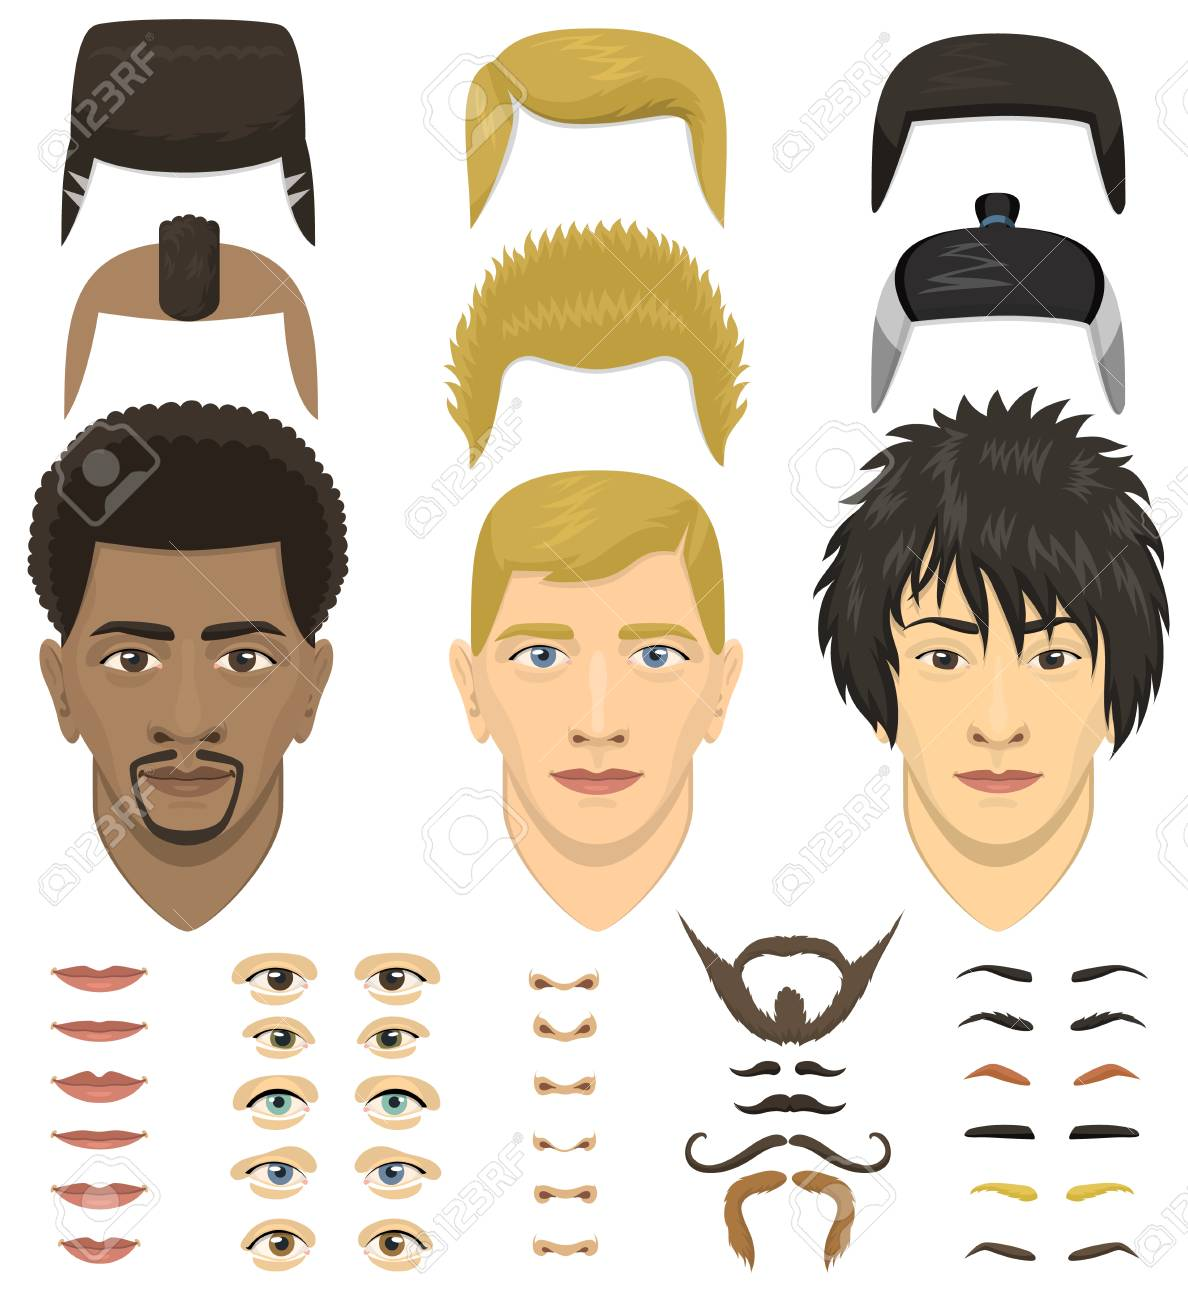 Man face portrait emotions constructor elements eyes, lips, beard, mustache avatar icon creator vector illustration. - 90157373